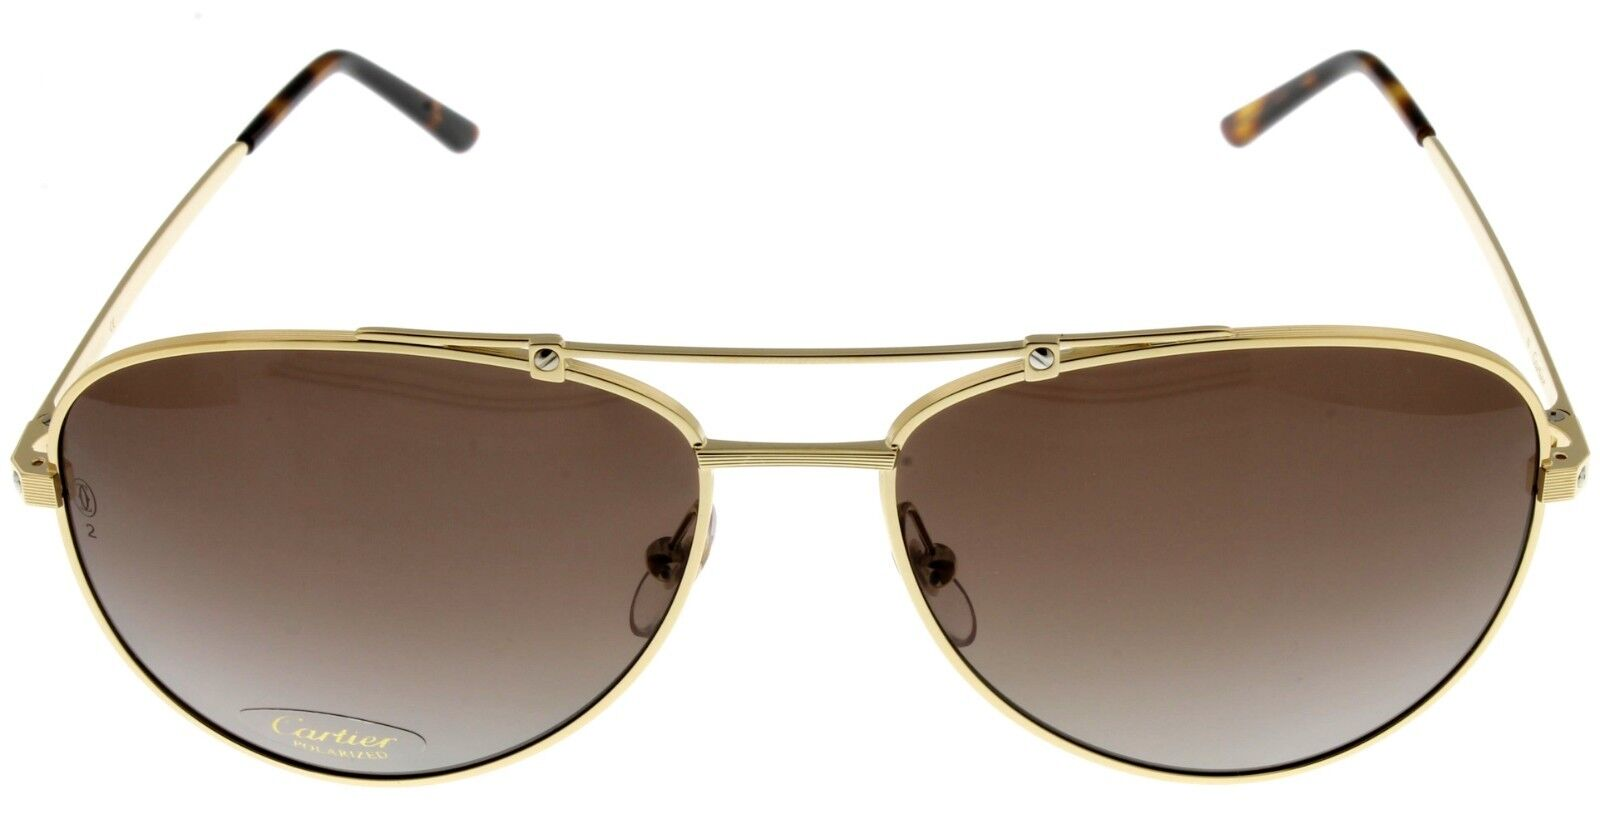 58bdd16b18 Мужские солнцезащитные очки Cartier Santos De Men Polarized Sunglasses  Brushed Gold Aviator ESW00131